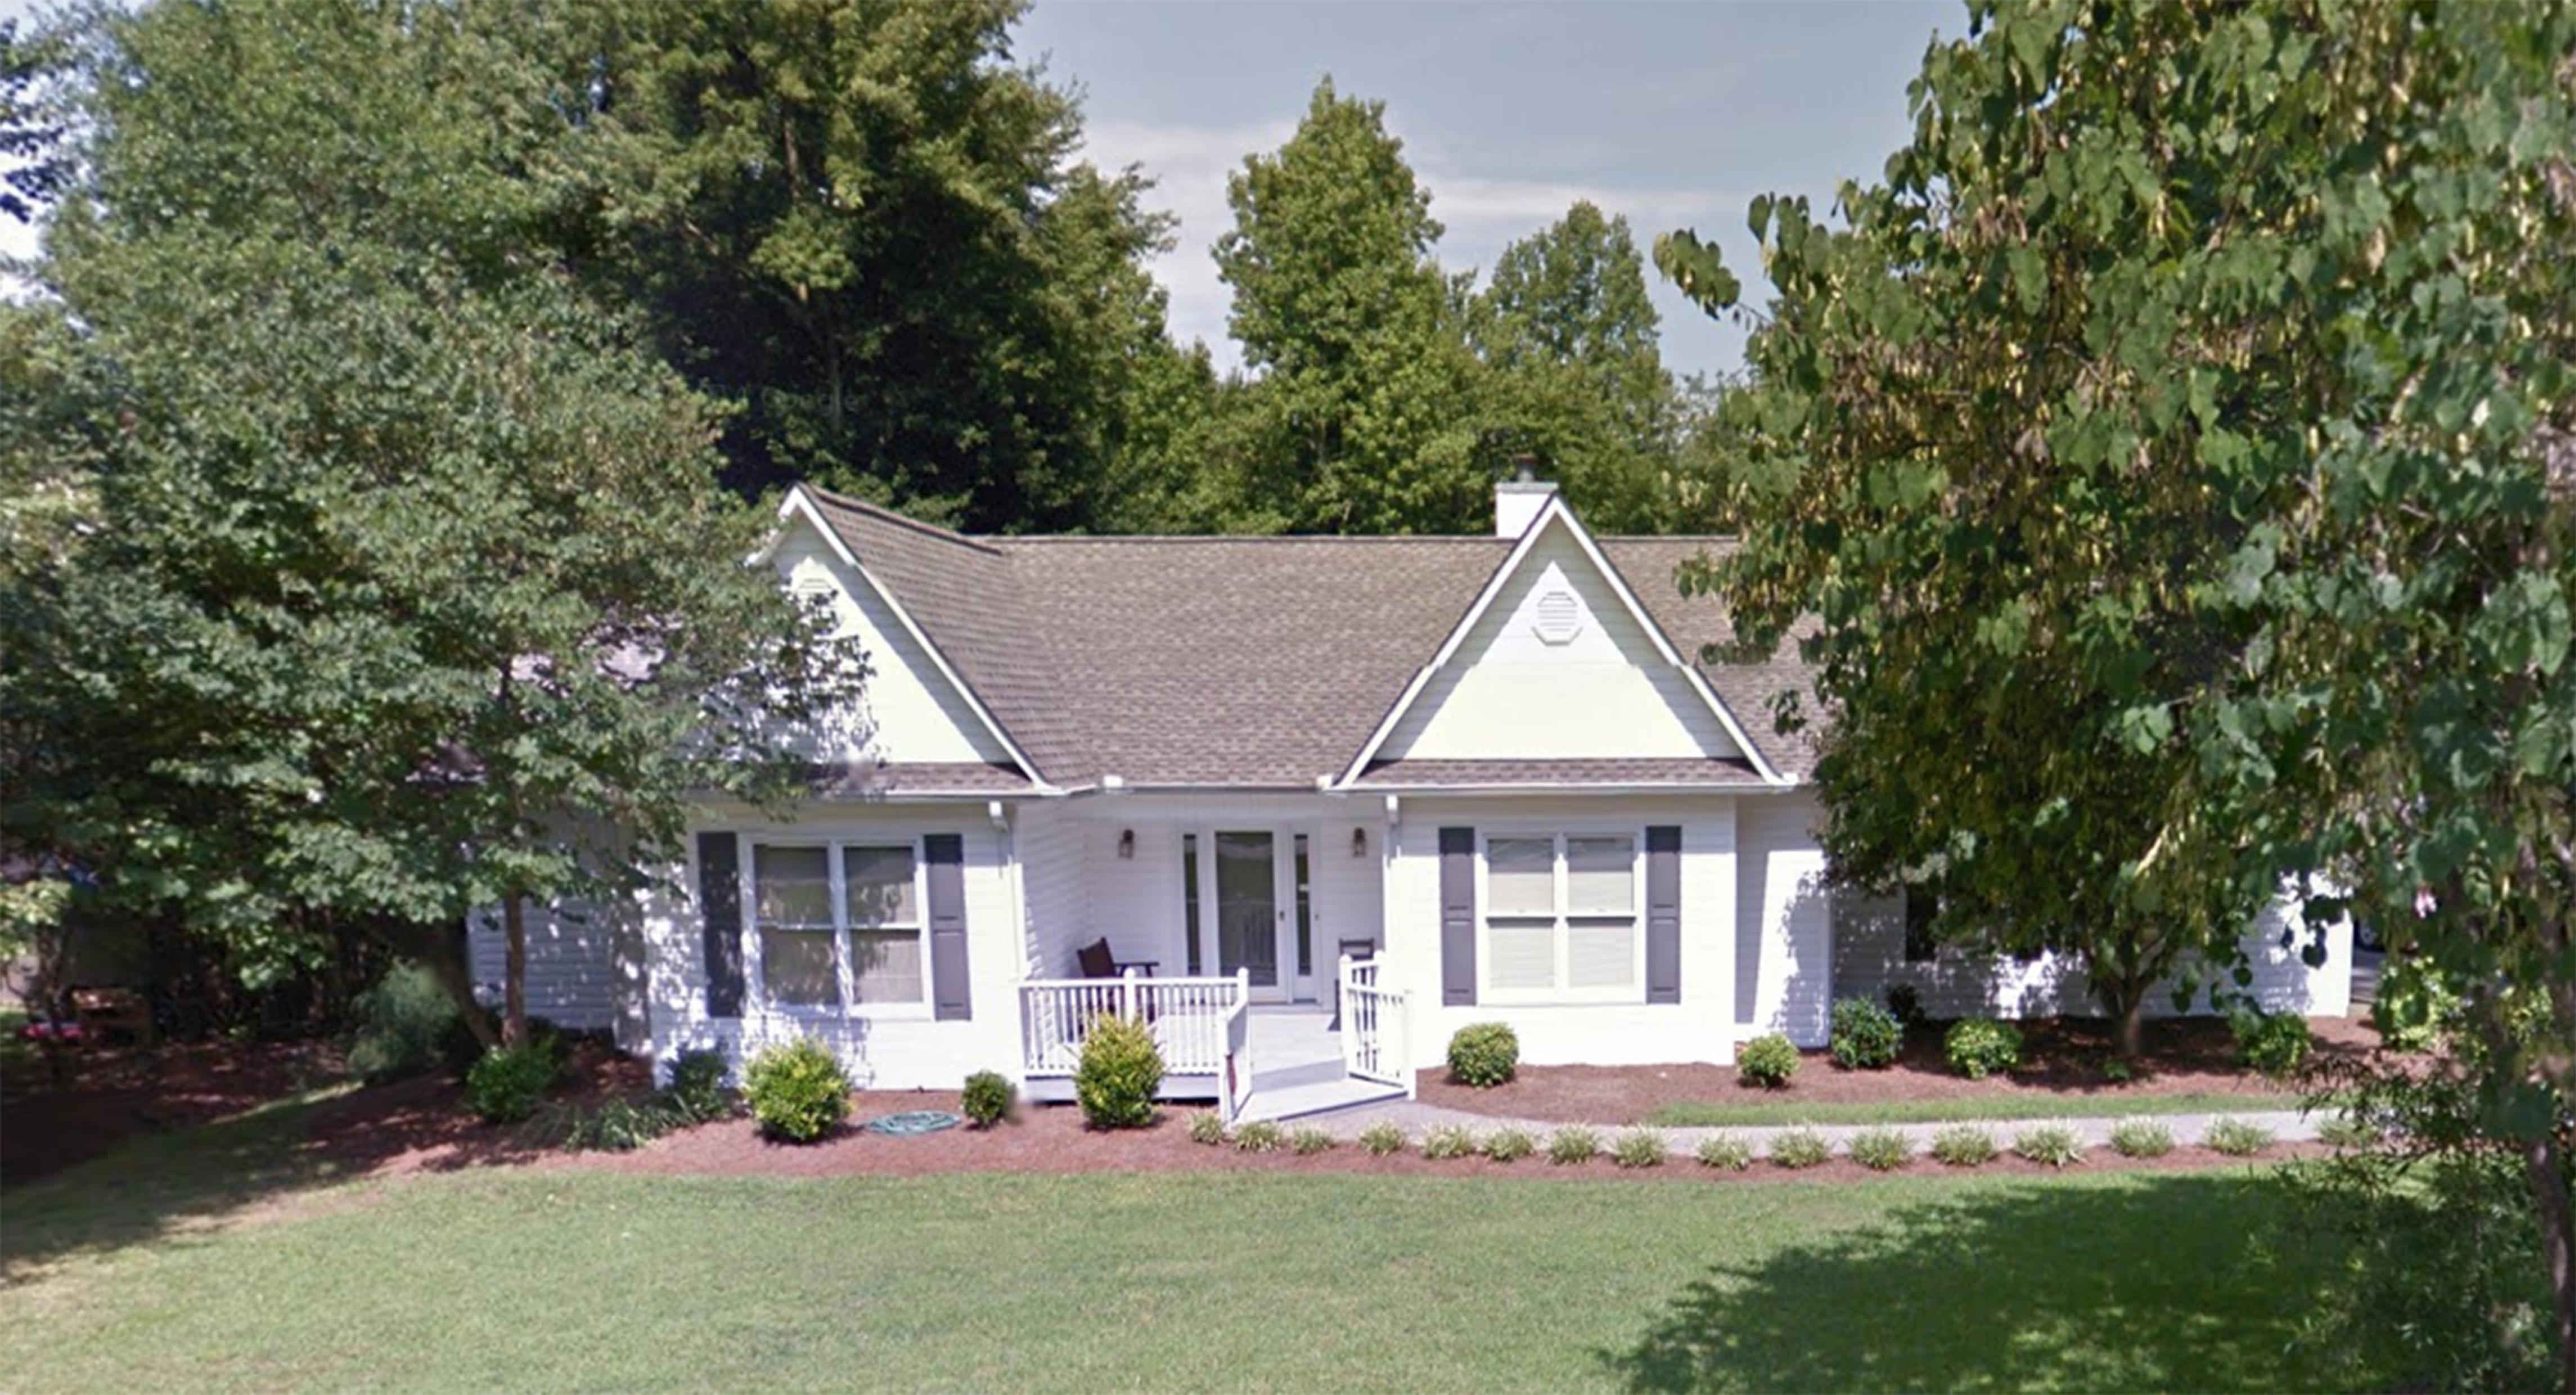 Digital painting digital art design blog for Digitally paint your house